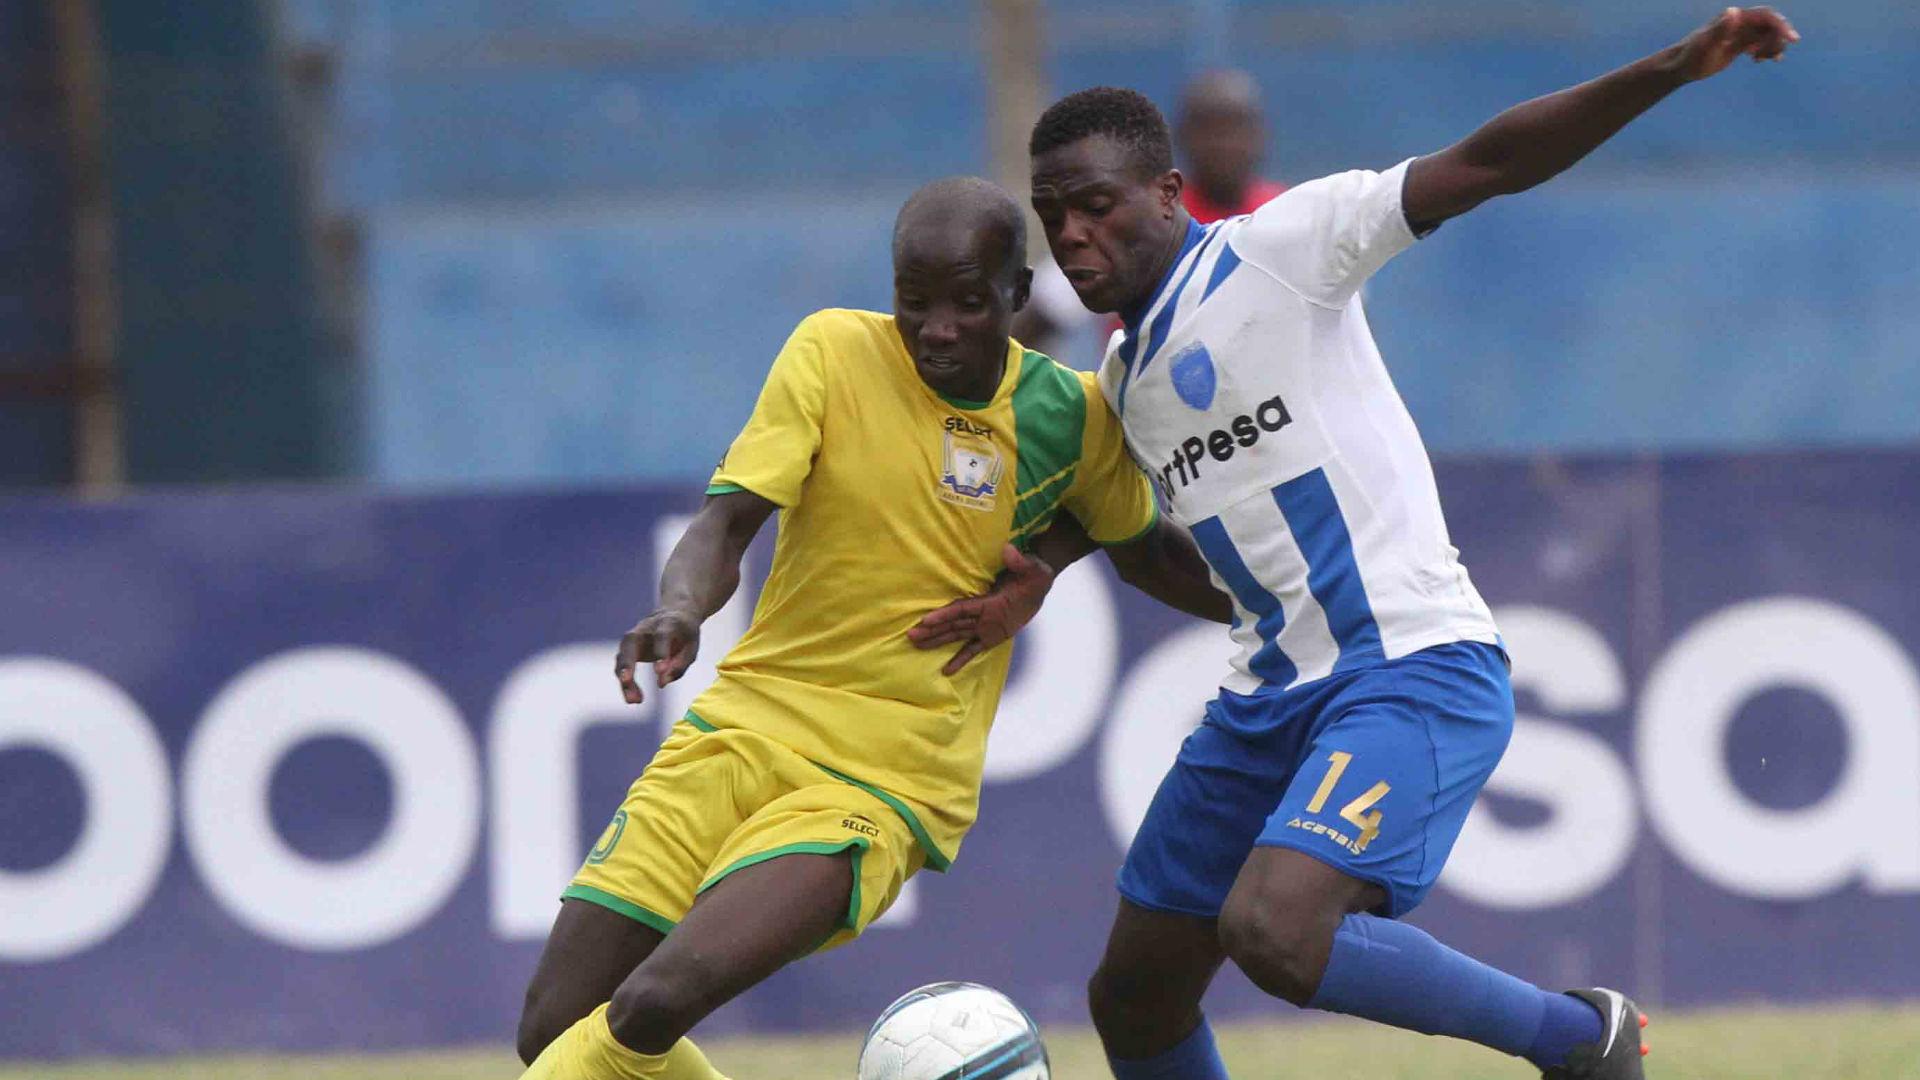 Kakamega Homeboyz chairman backs Mudavadi to be star player for Kenya at Cecafa Senior Challenge Cup